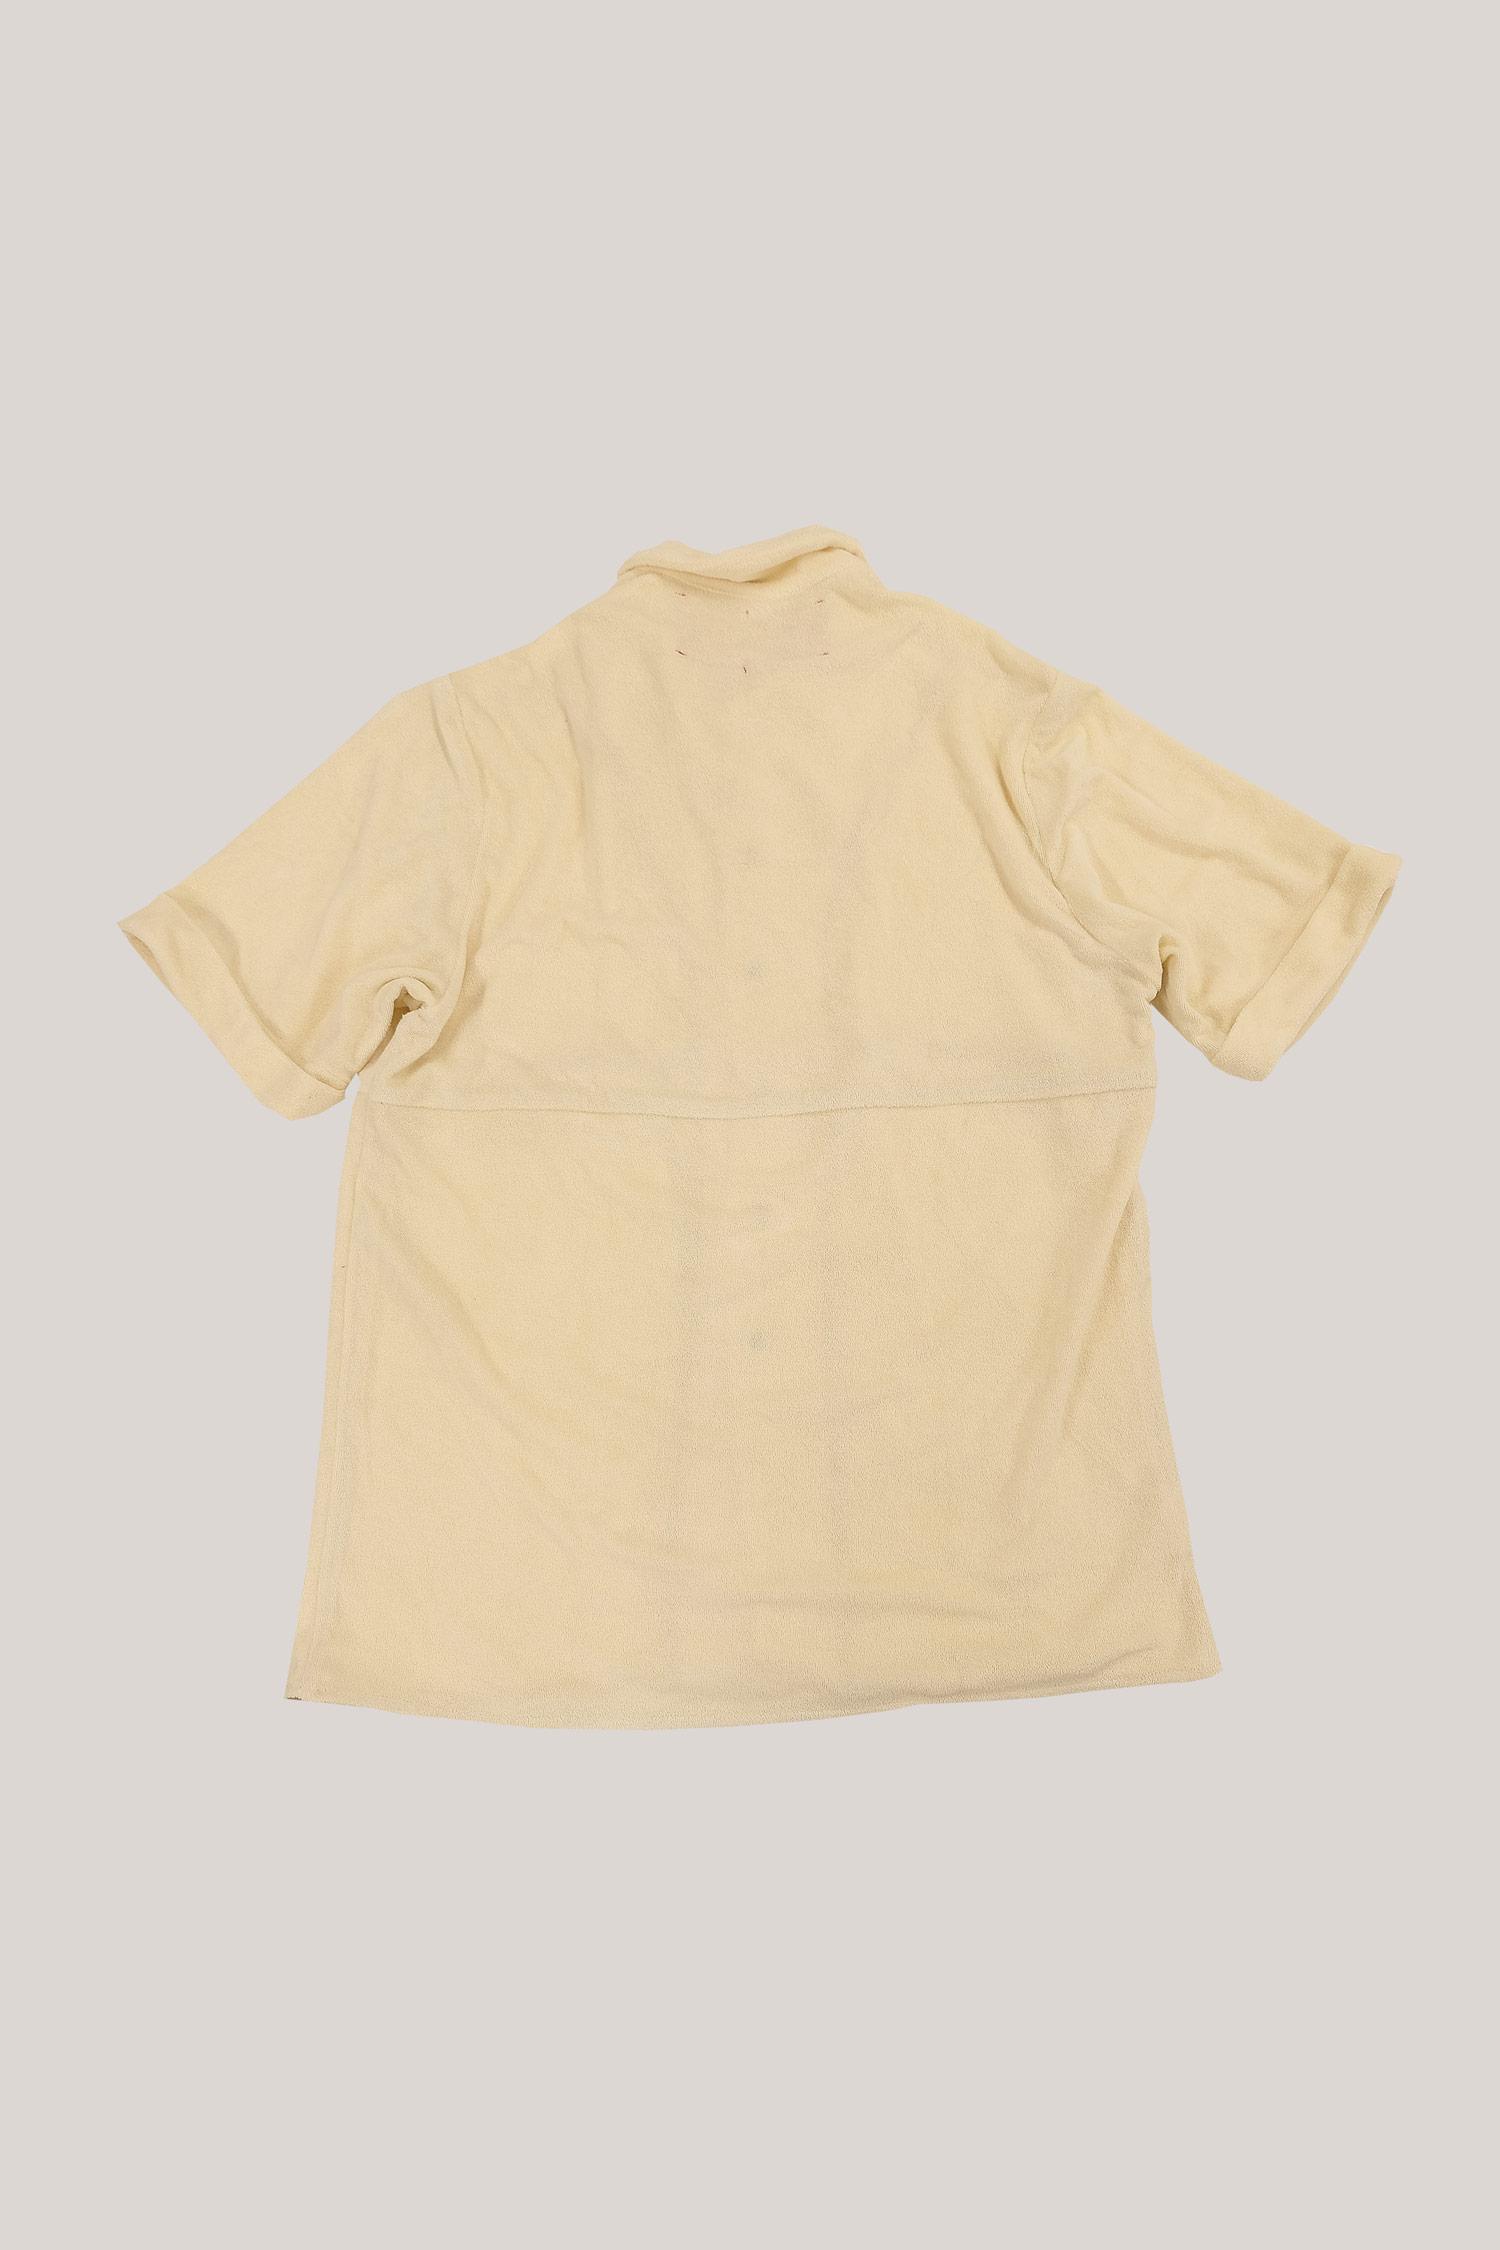 31-Terry-Shirt-2